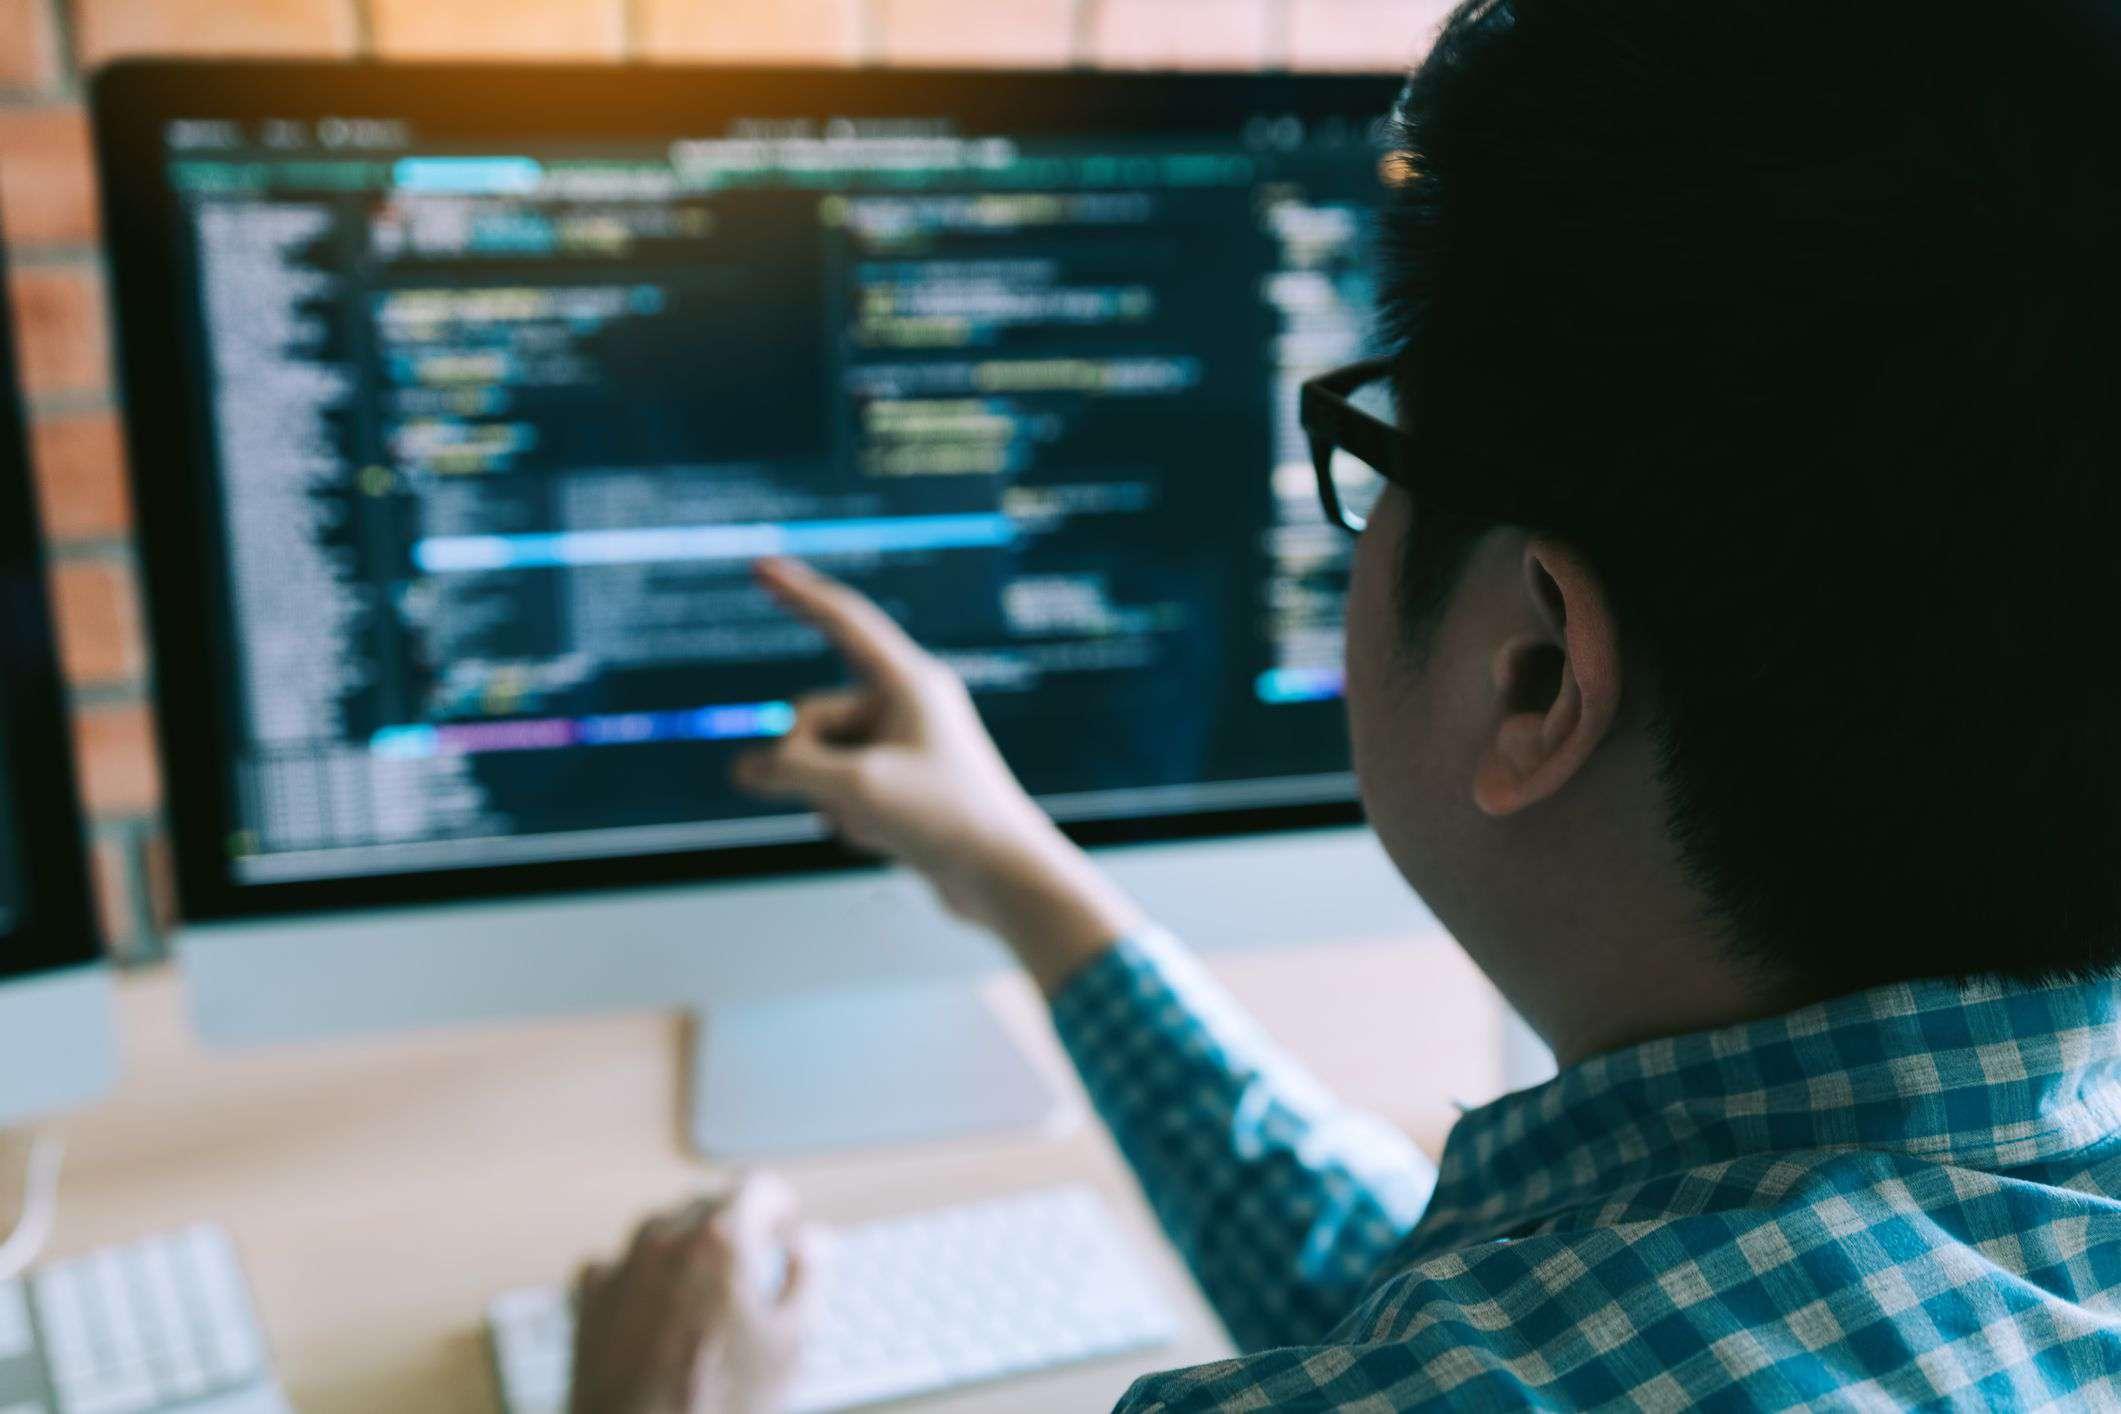 Man looking at computer code on screen